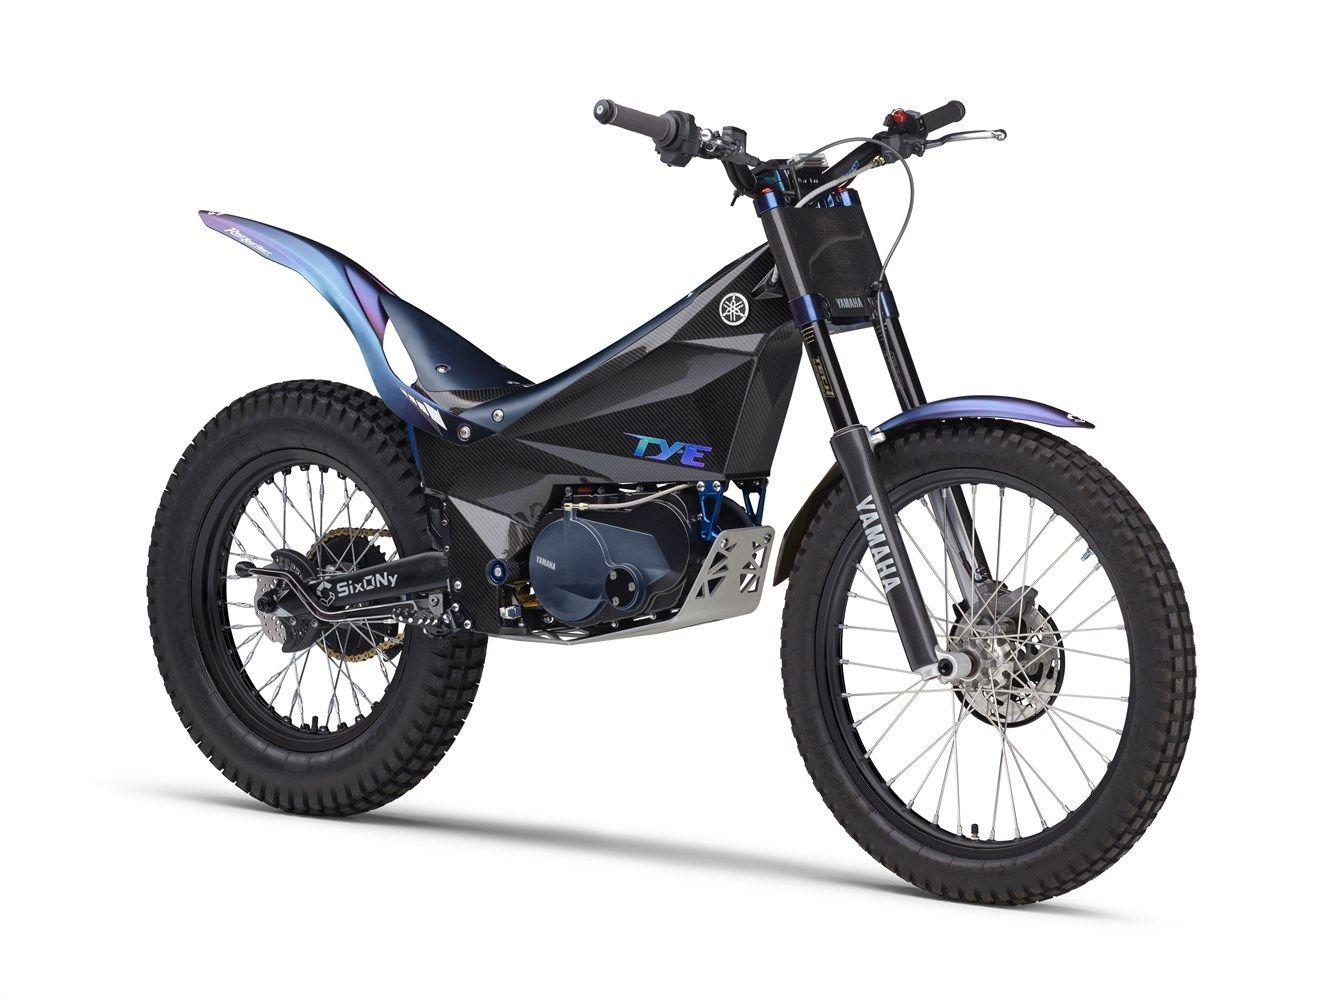 2020 Yamaha Ty E Electric Trials Bike Trial Bike Electric